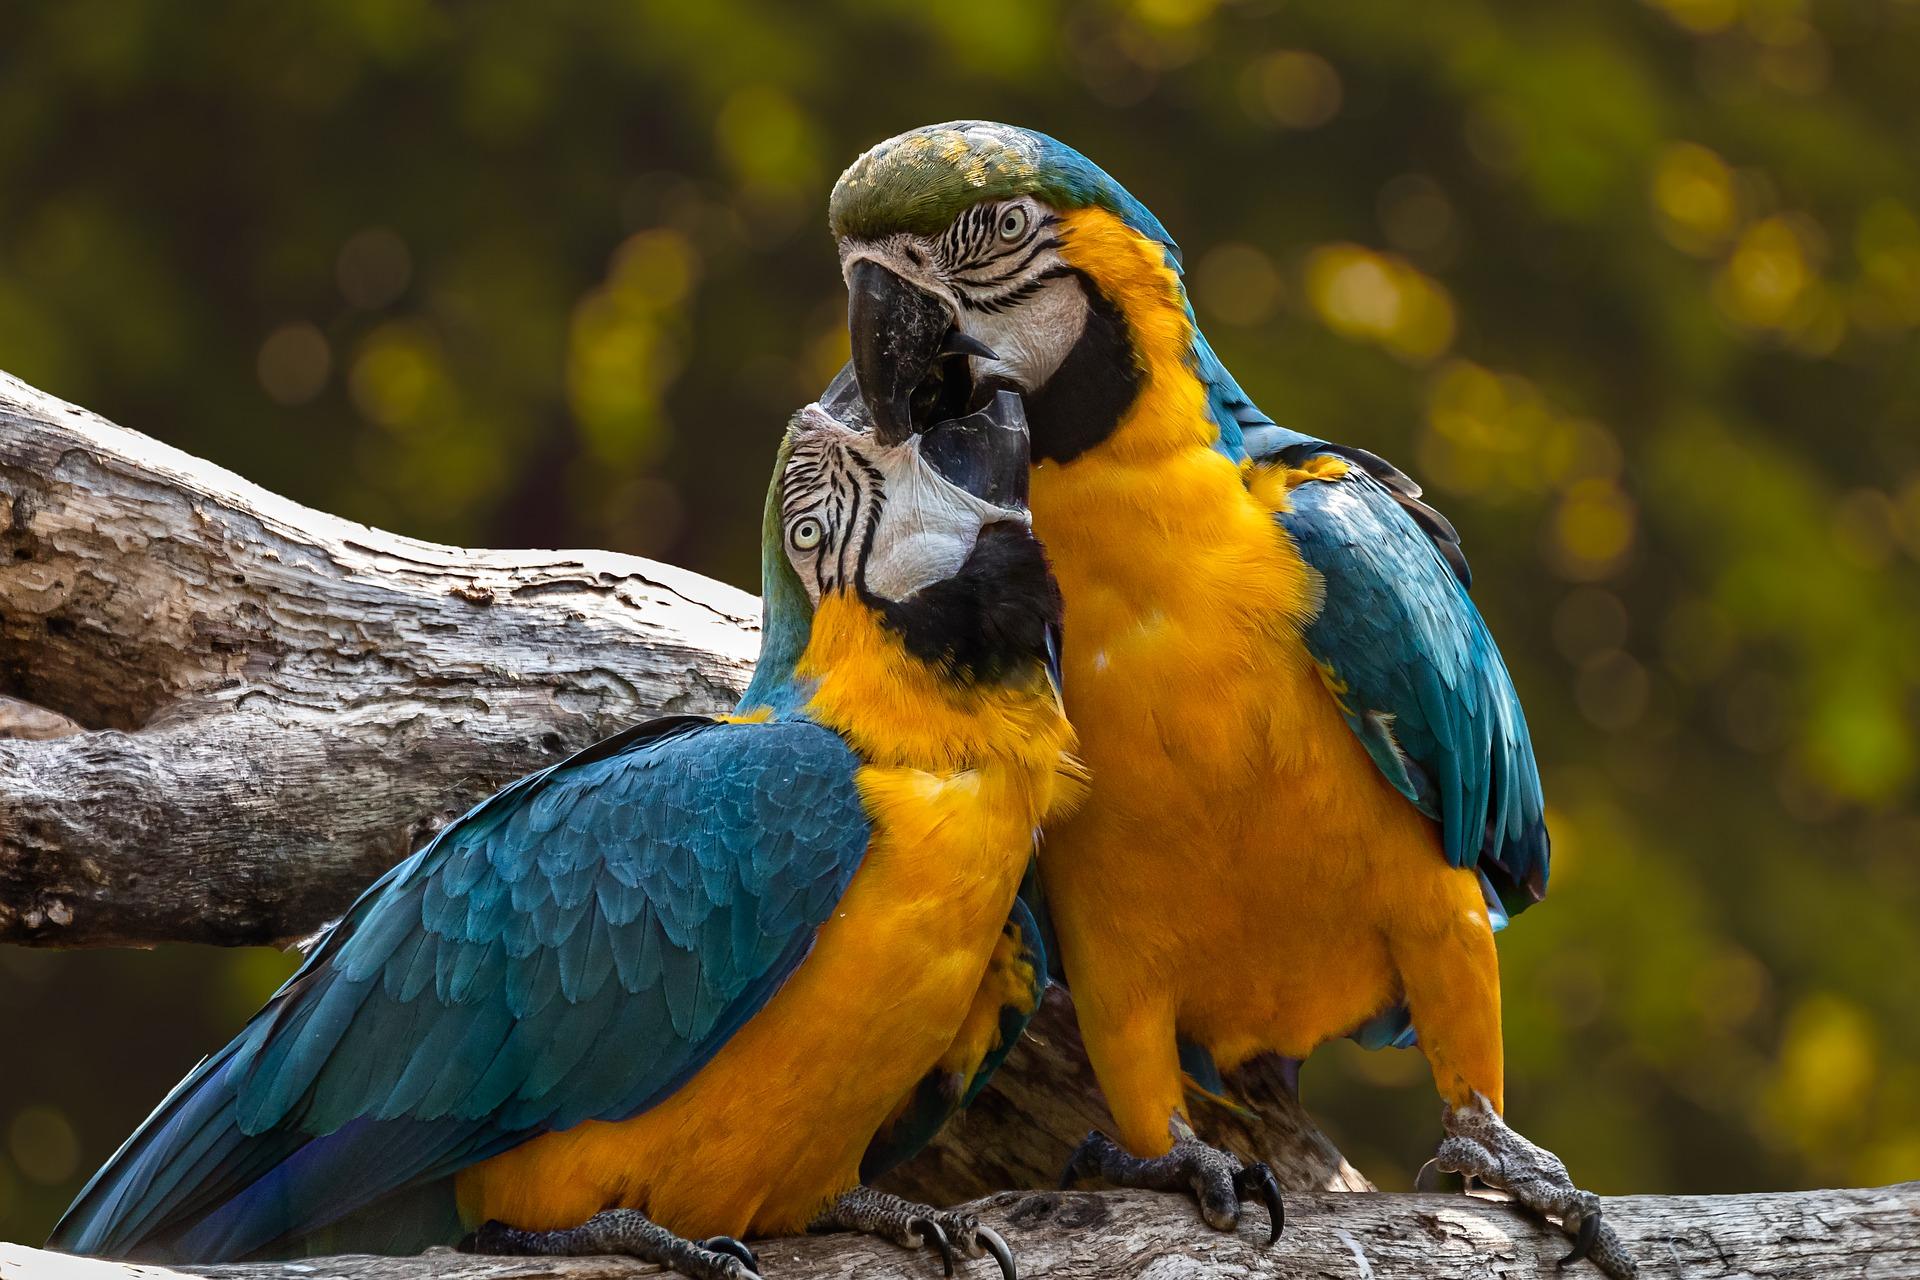 horoscop zilnic dragoste - sfatulparintilor.ro - pixabay_com - parrots-3427188_1920